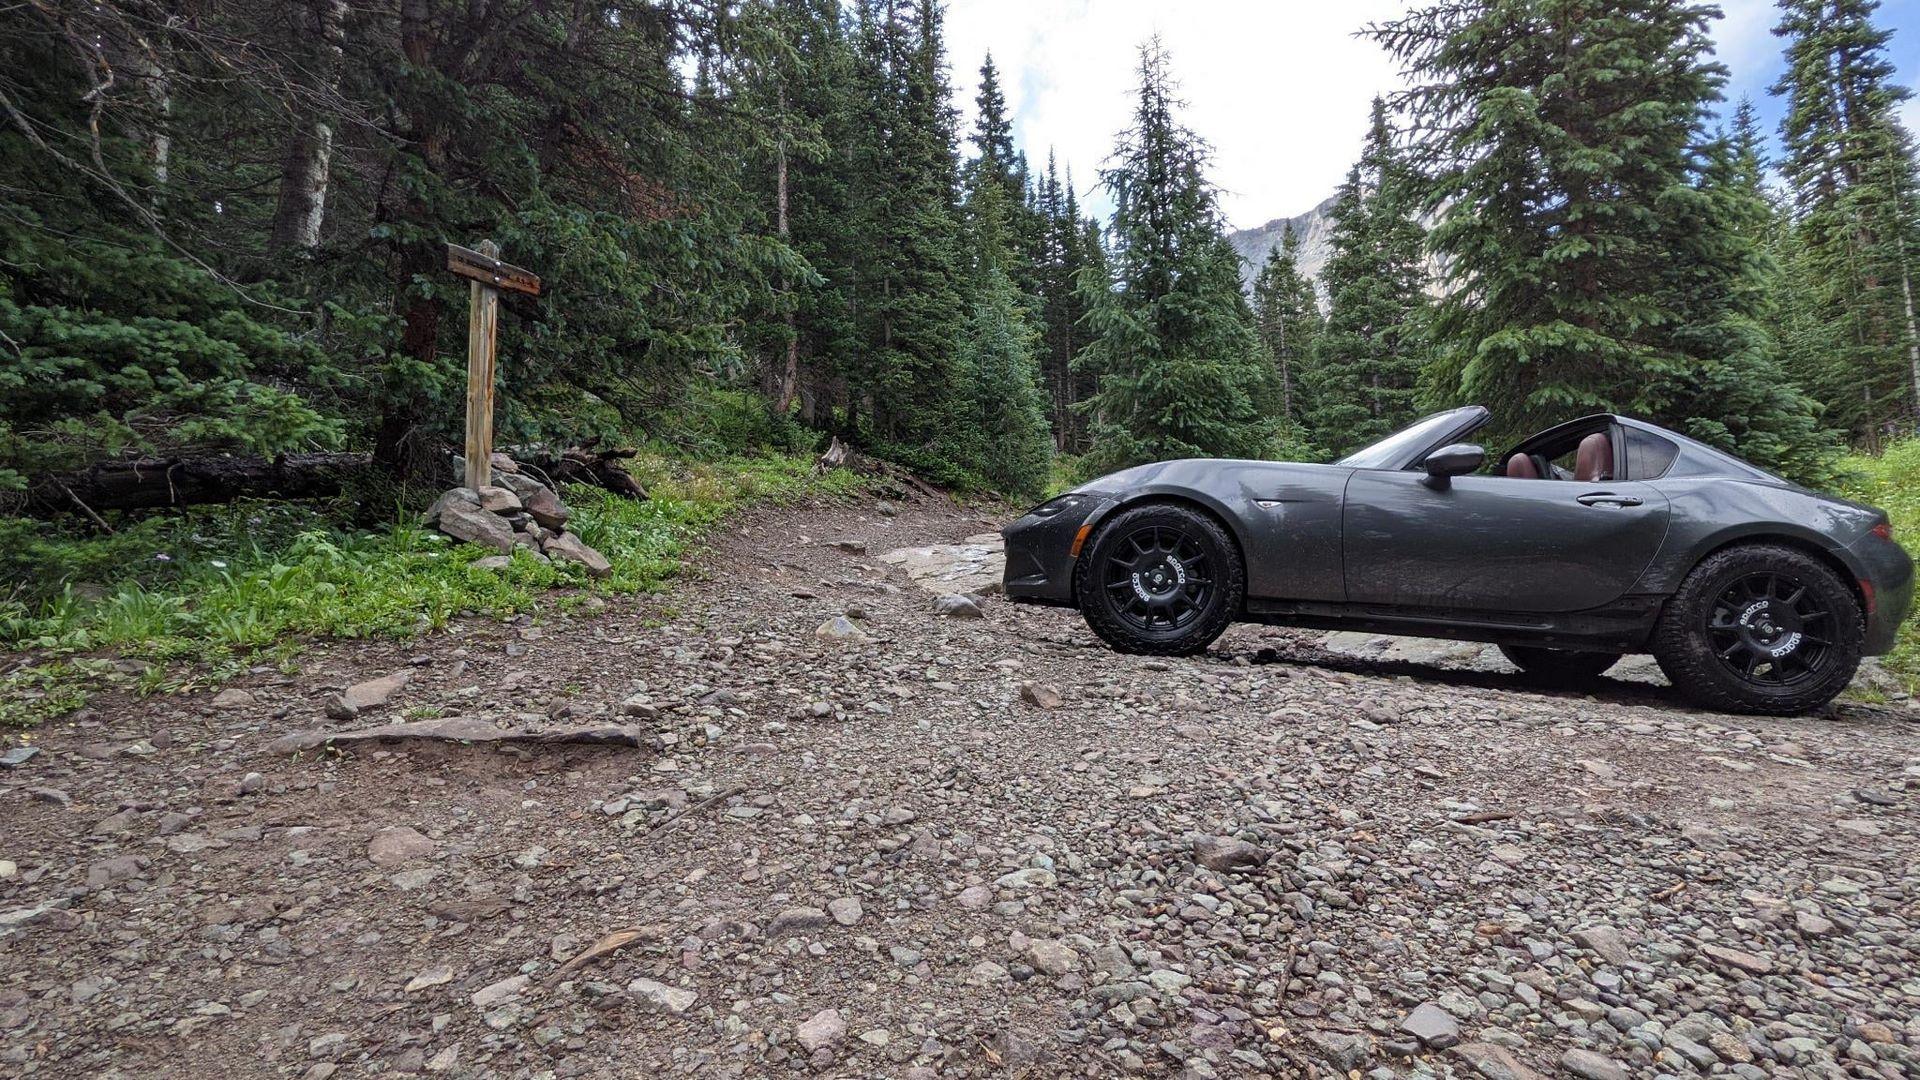 Mazda-MX-5-RF-off-road-6